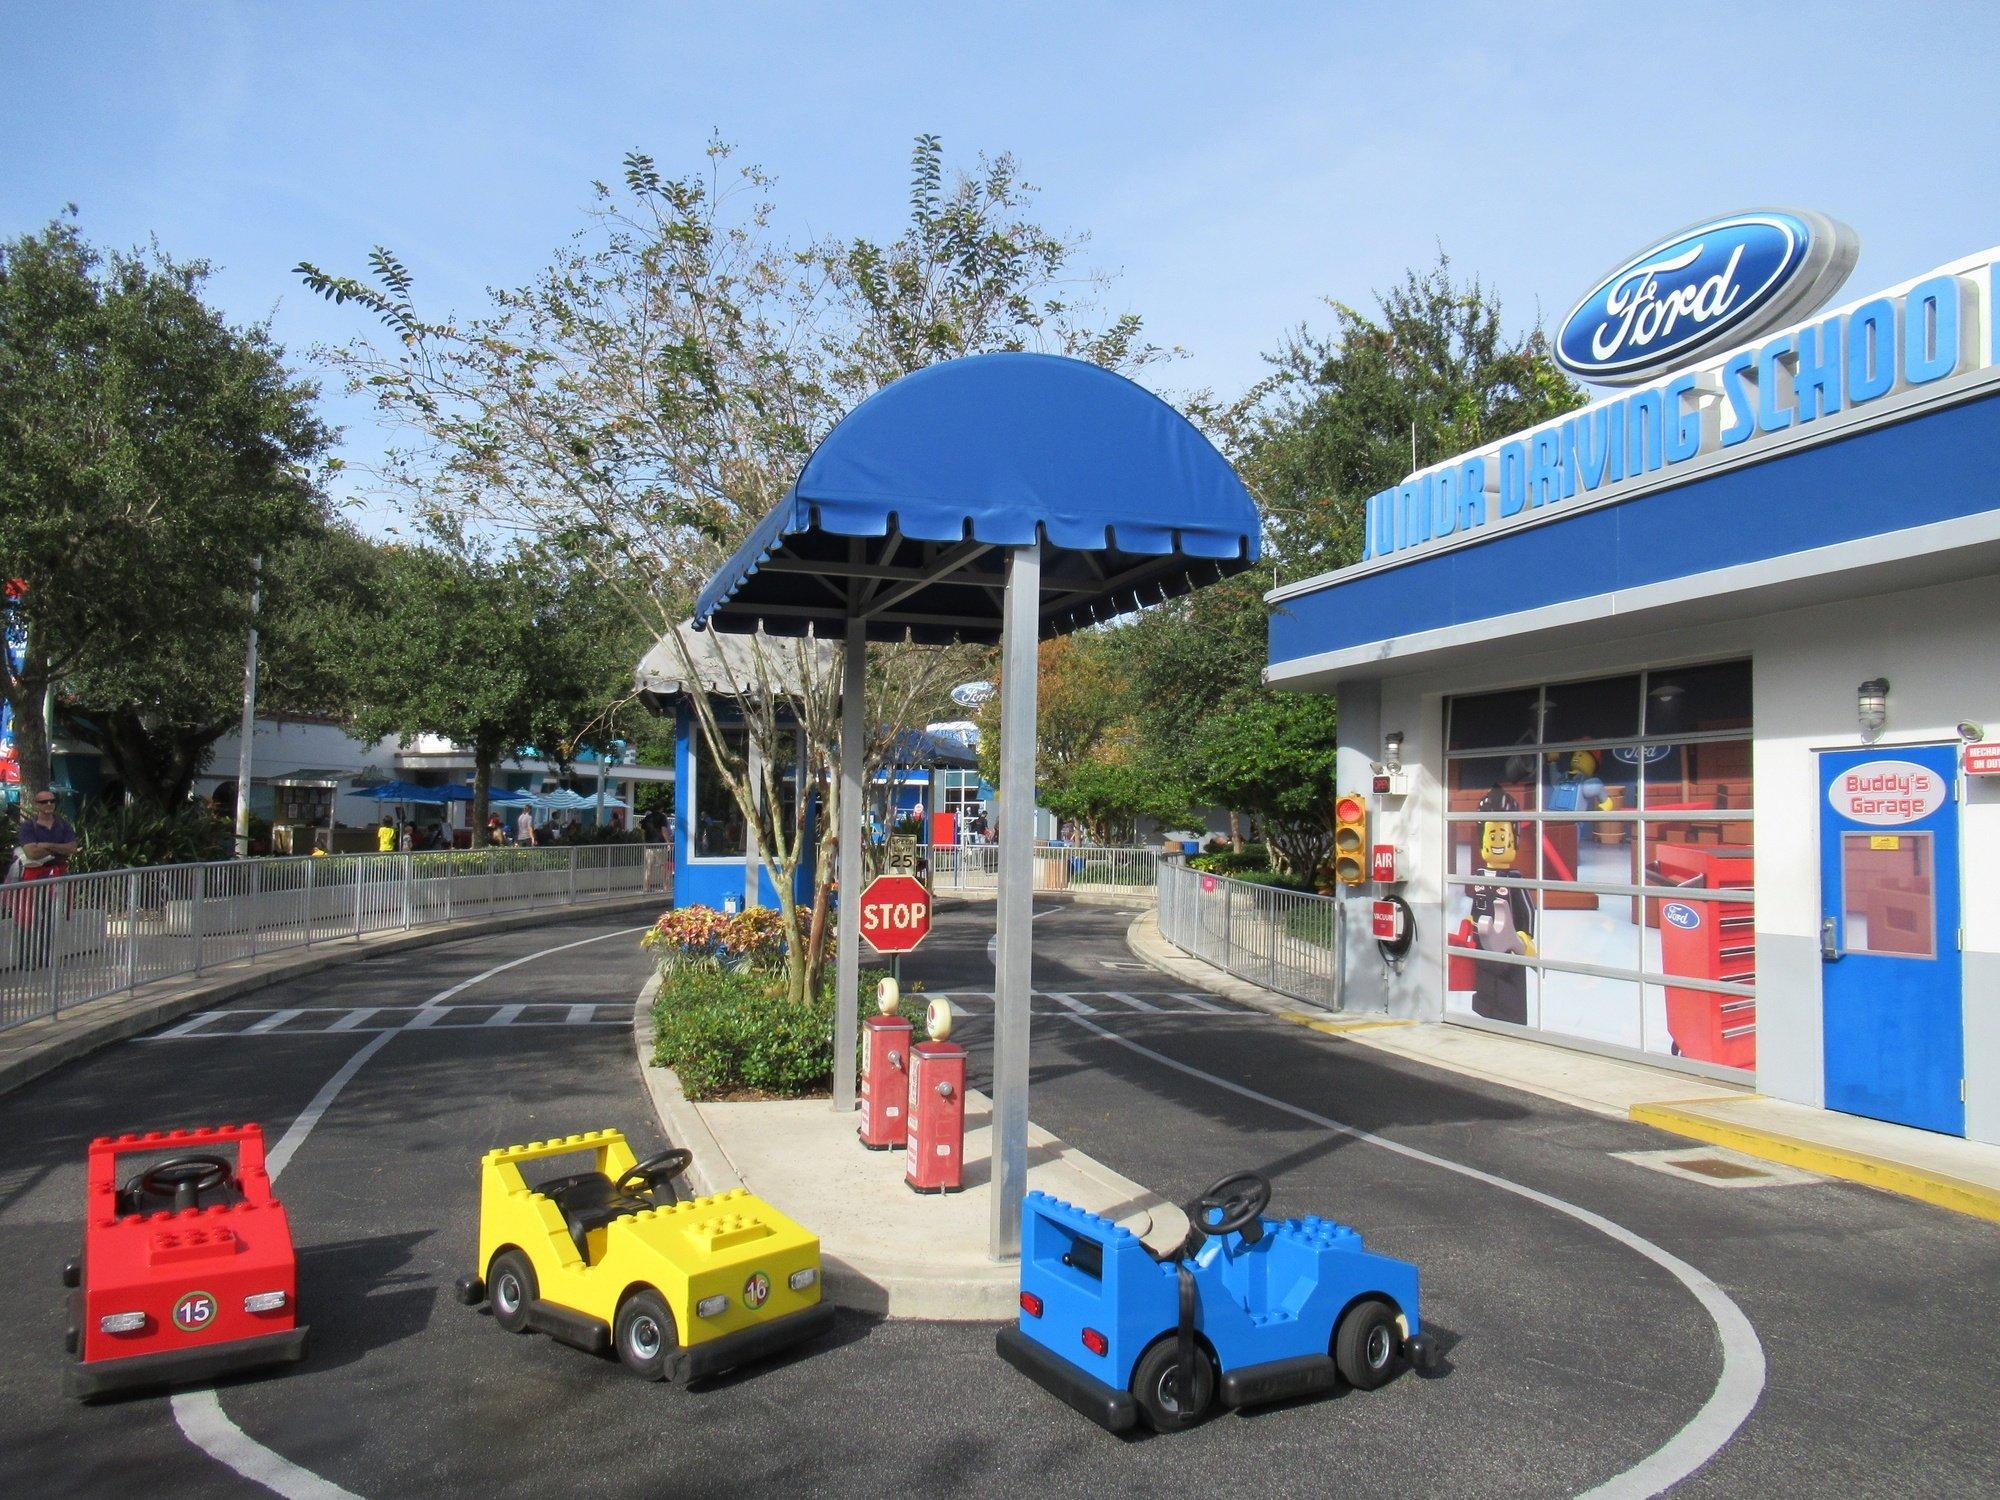 Legoland Florida Ford Driving School for kids